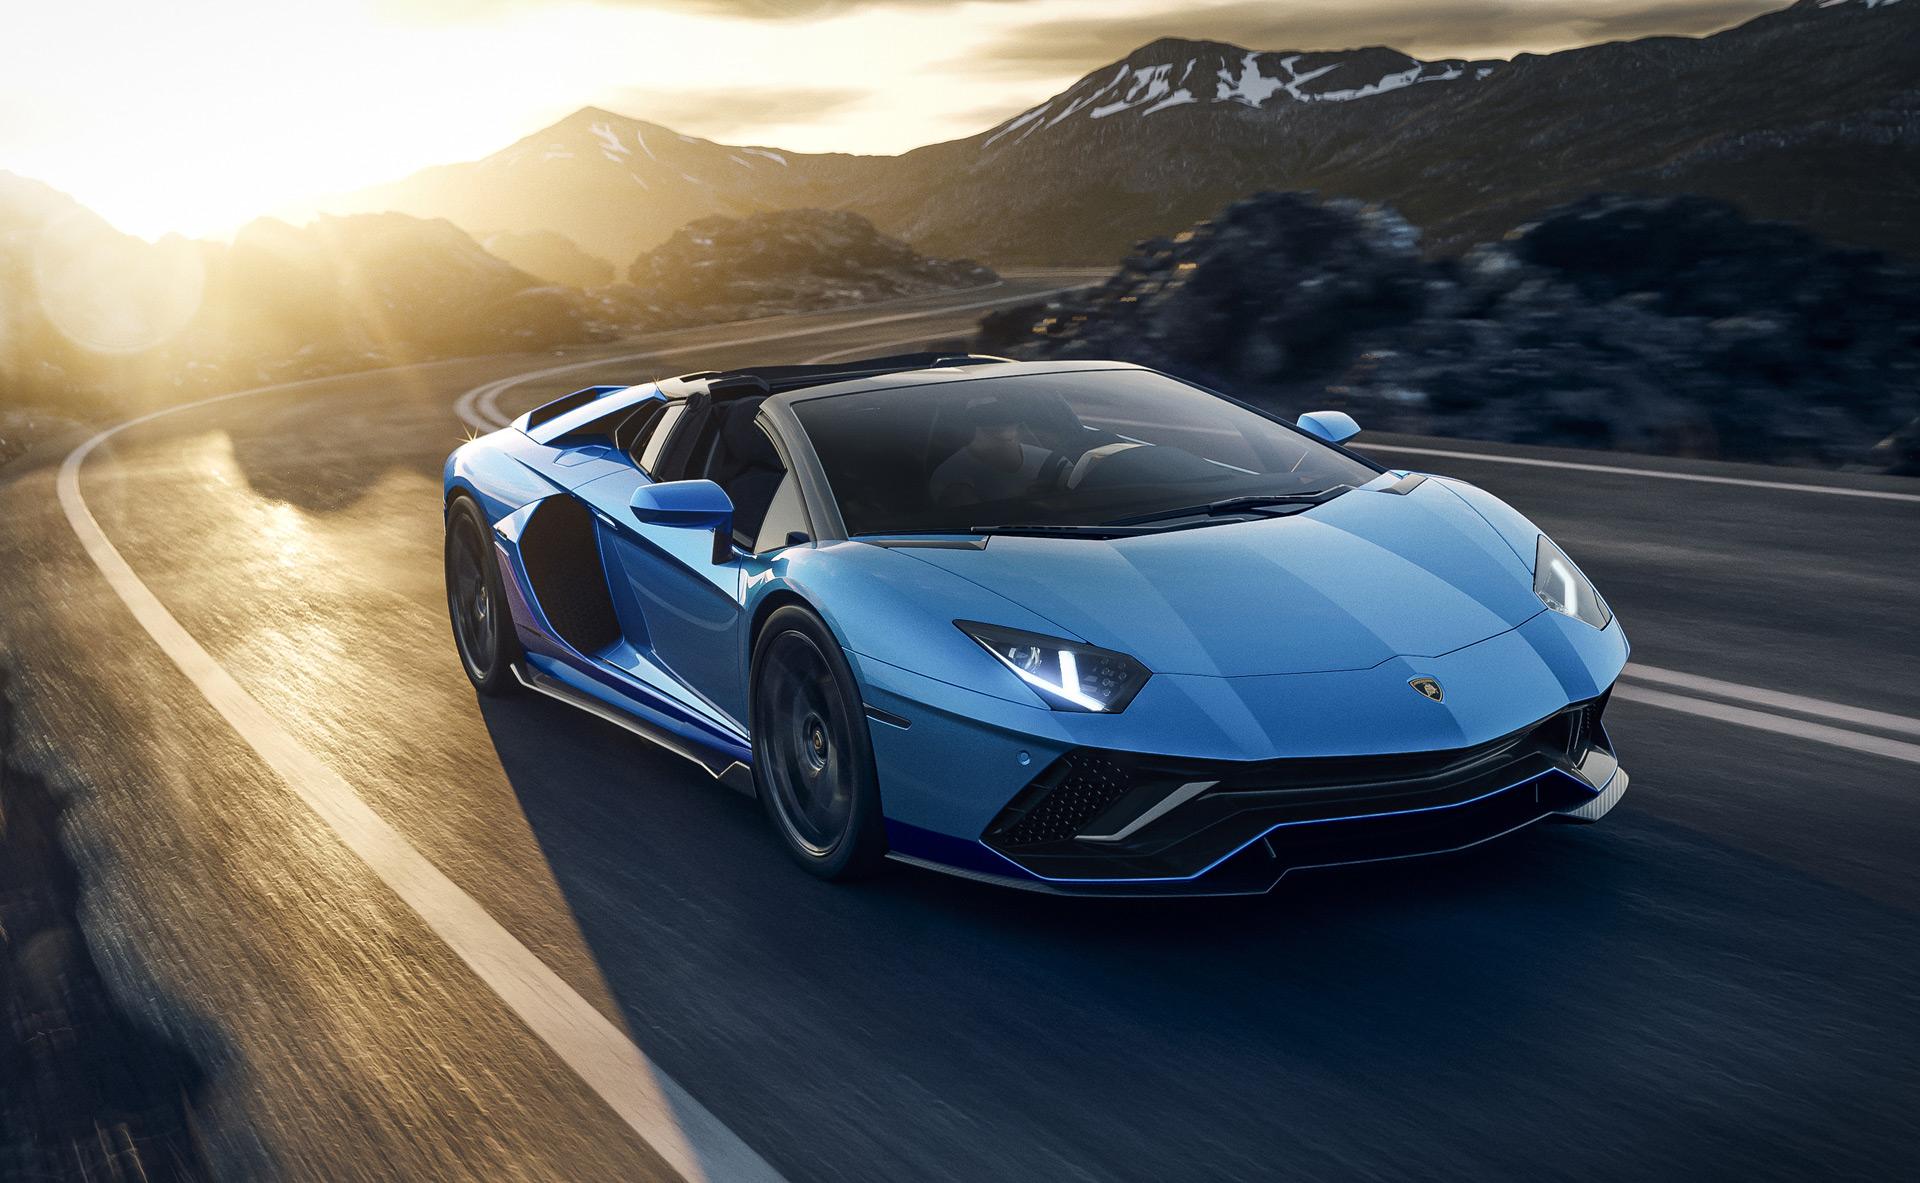 Lamborghini_Aventador_Ultimae (1)